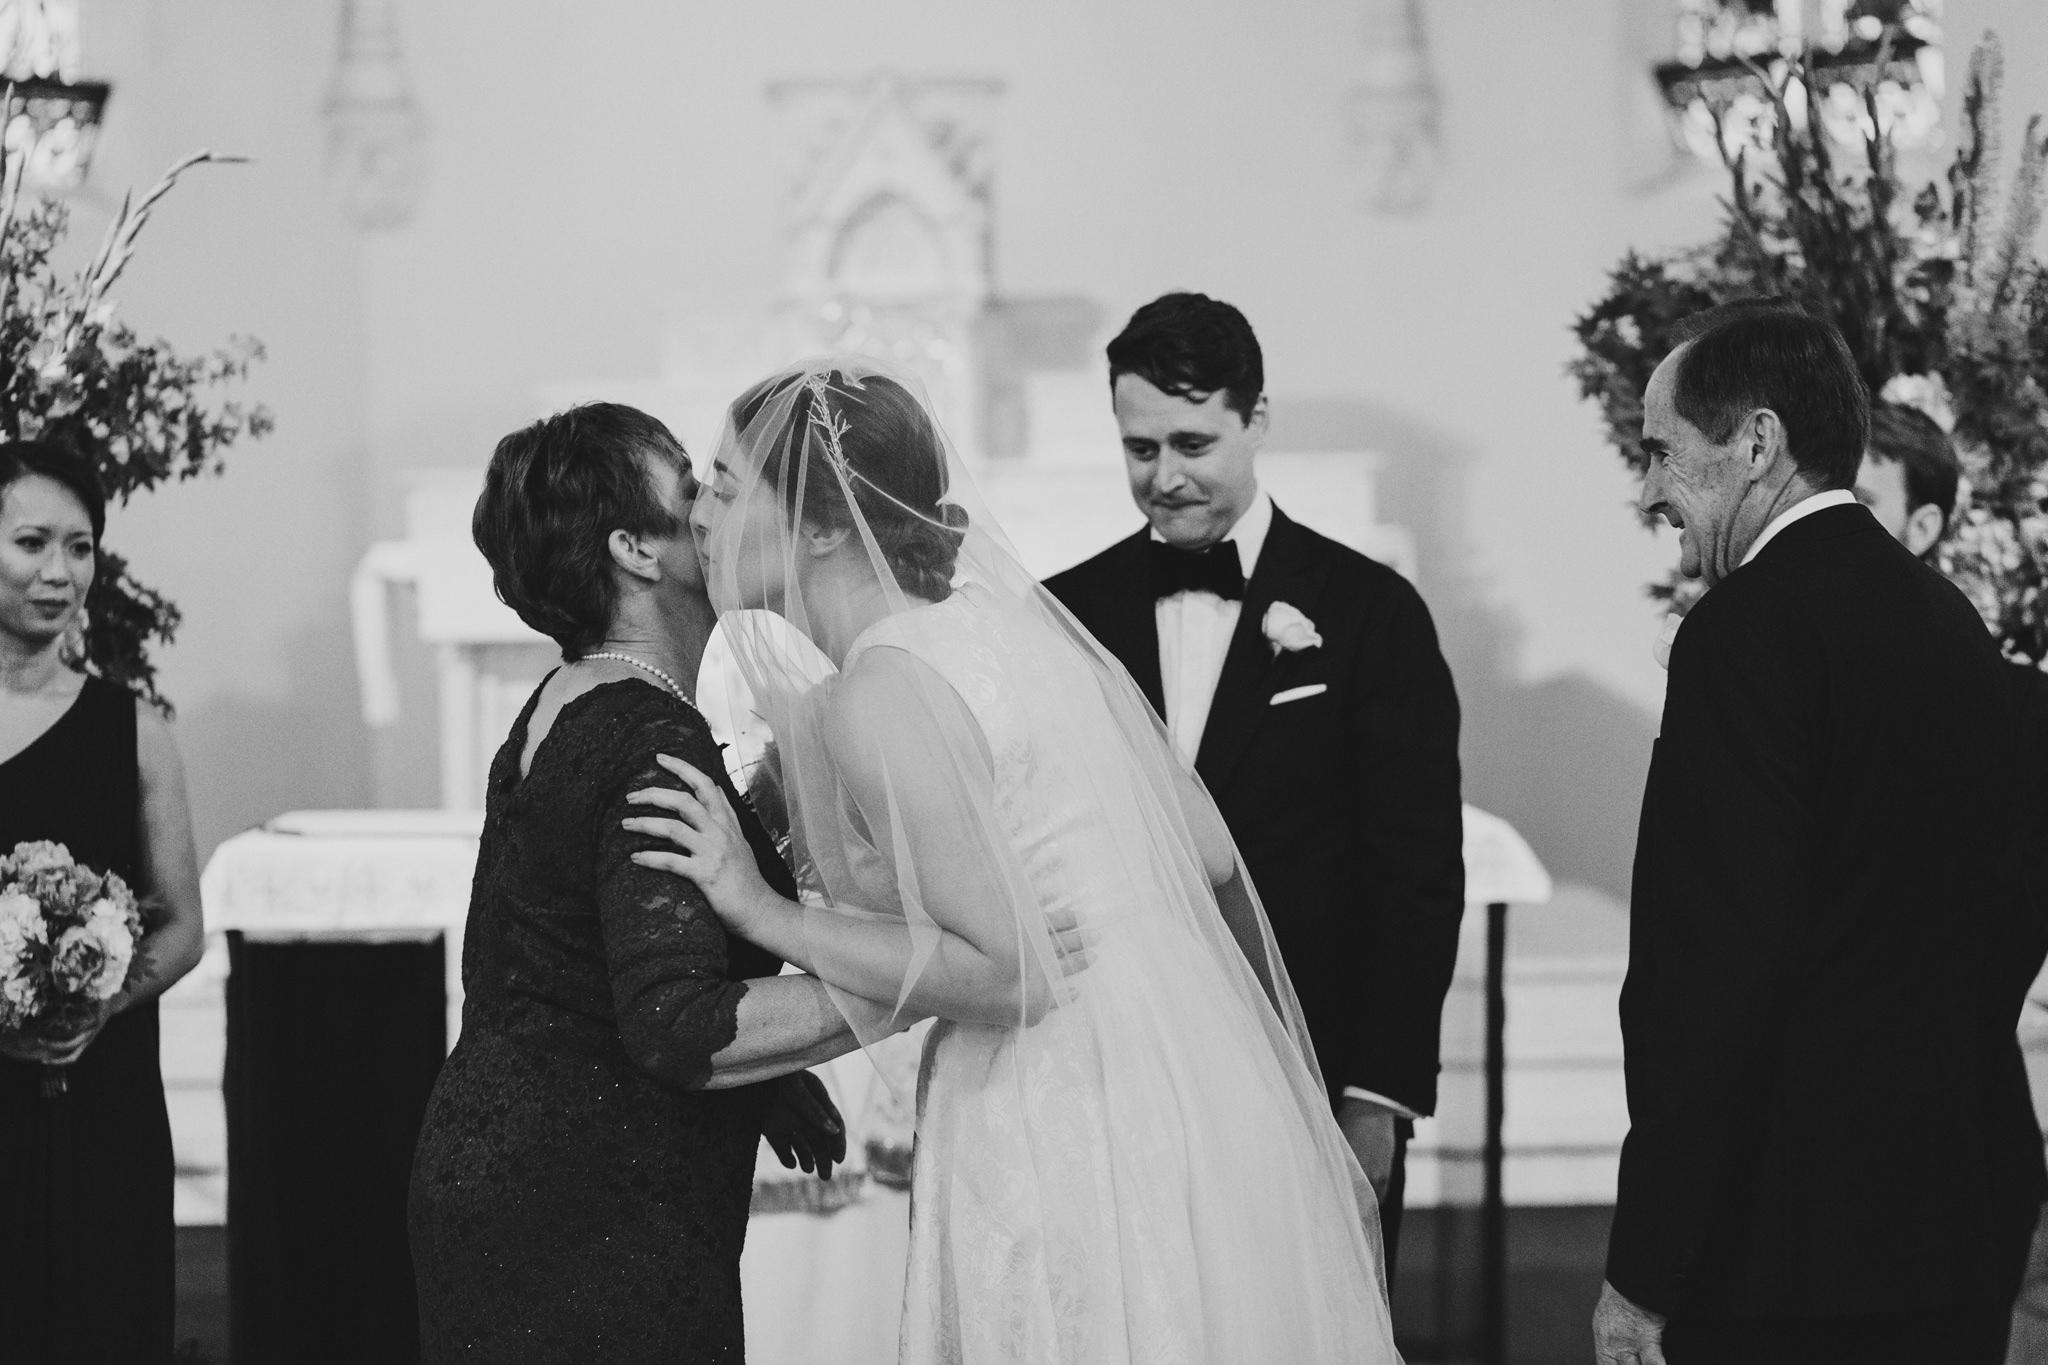 Abbotsford_Convent_Wedding_Peter_Anna052.JPG